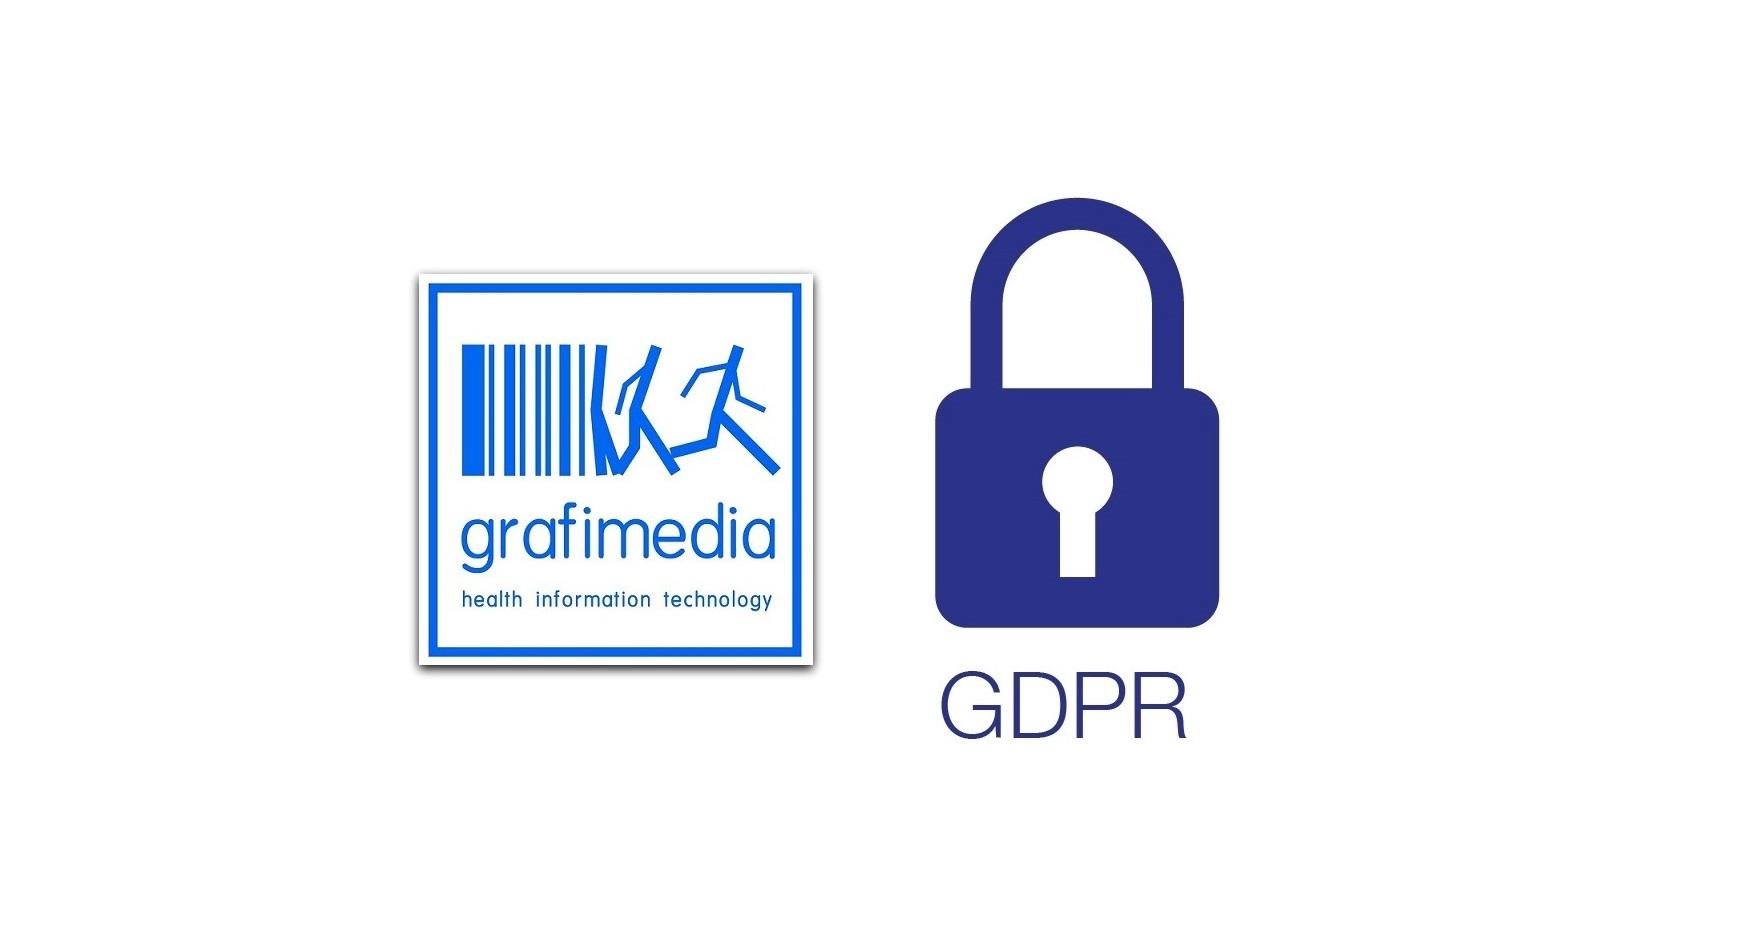 GDPR regulation by Grafimedia